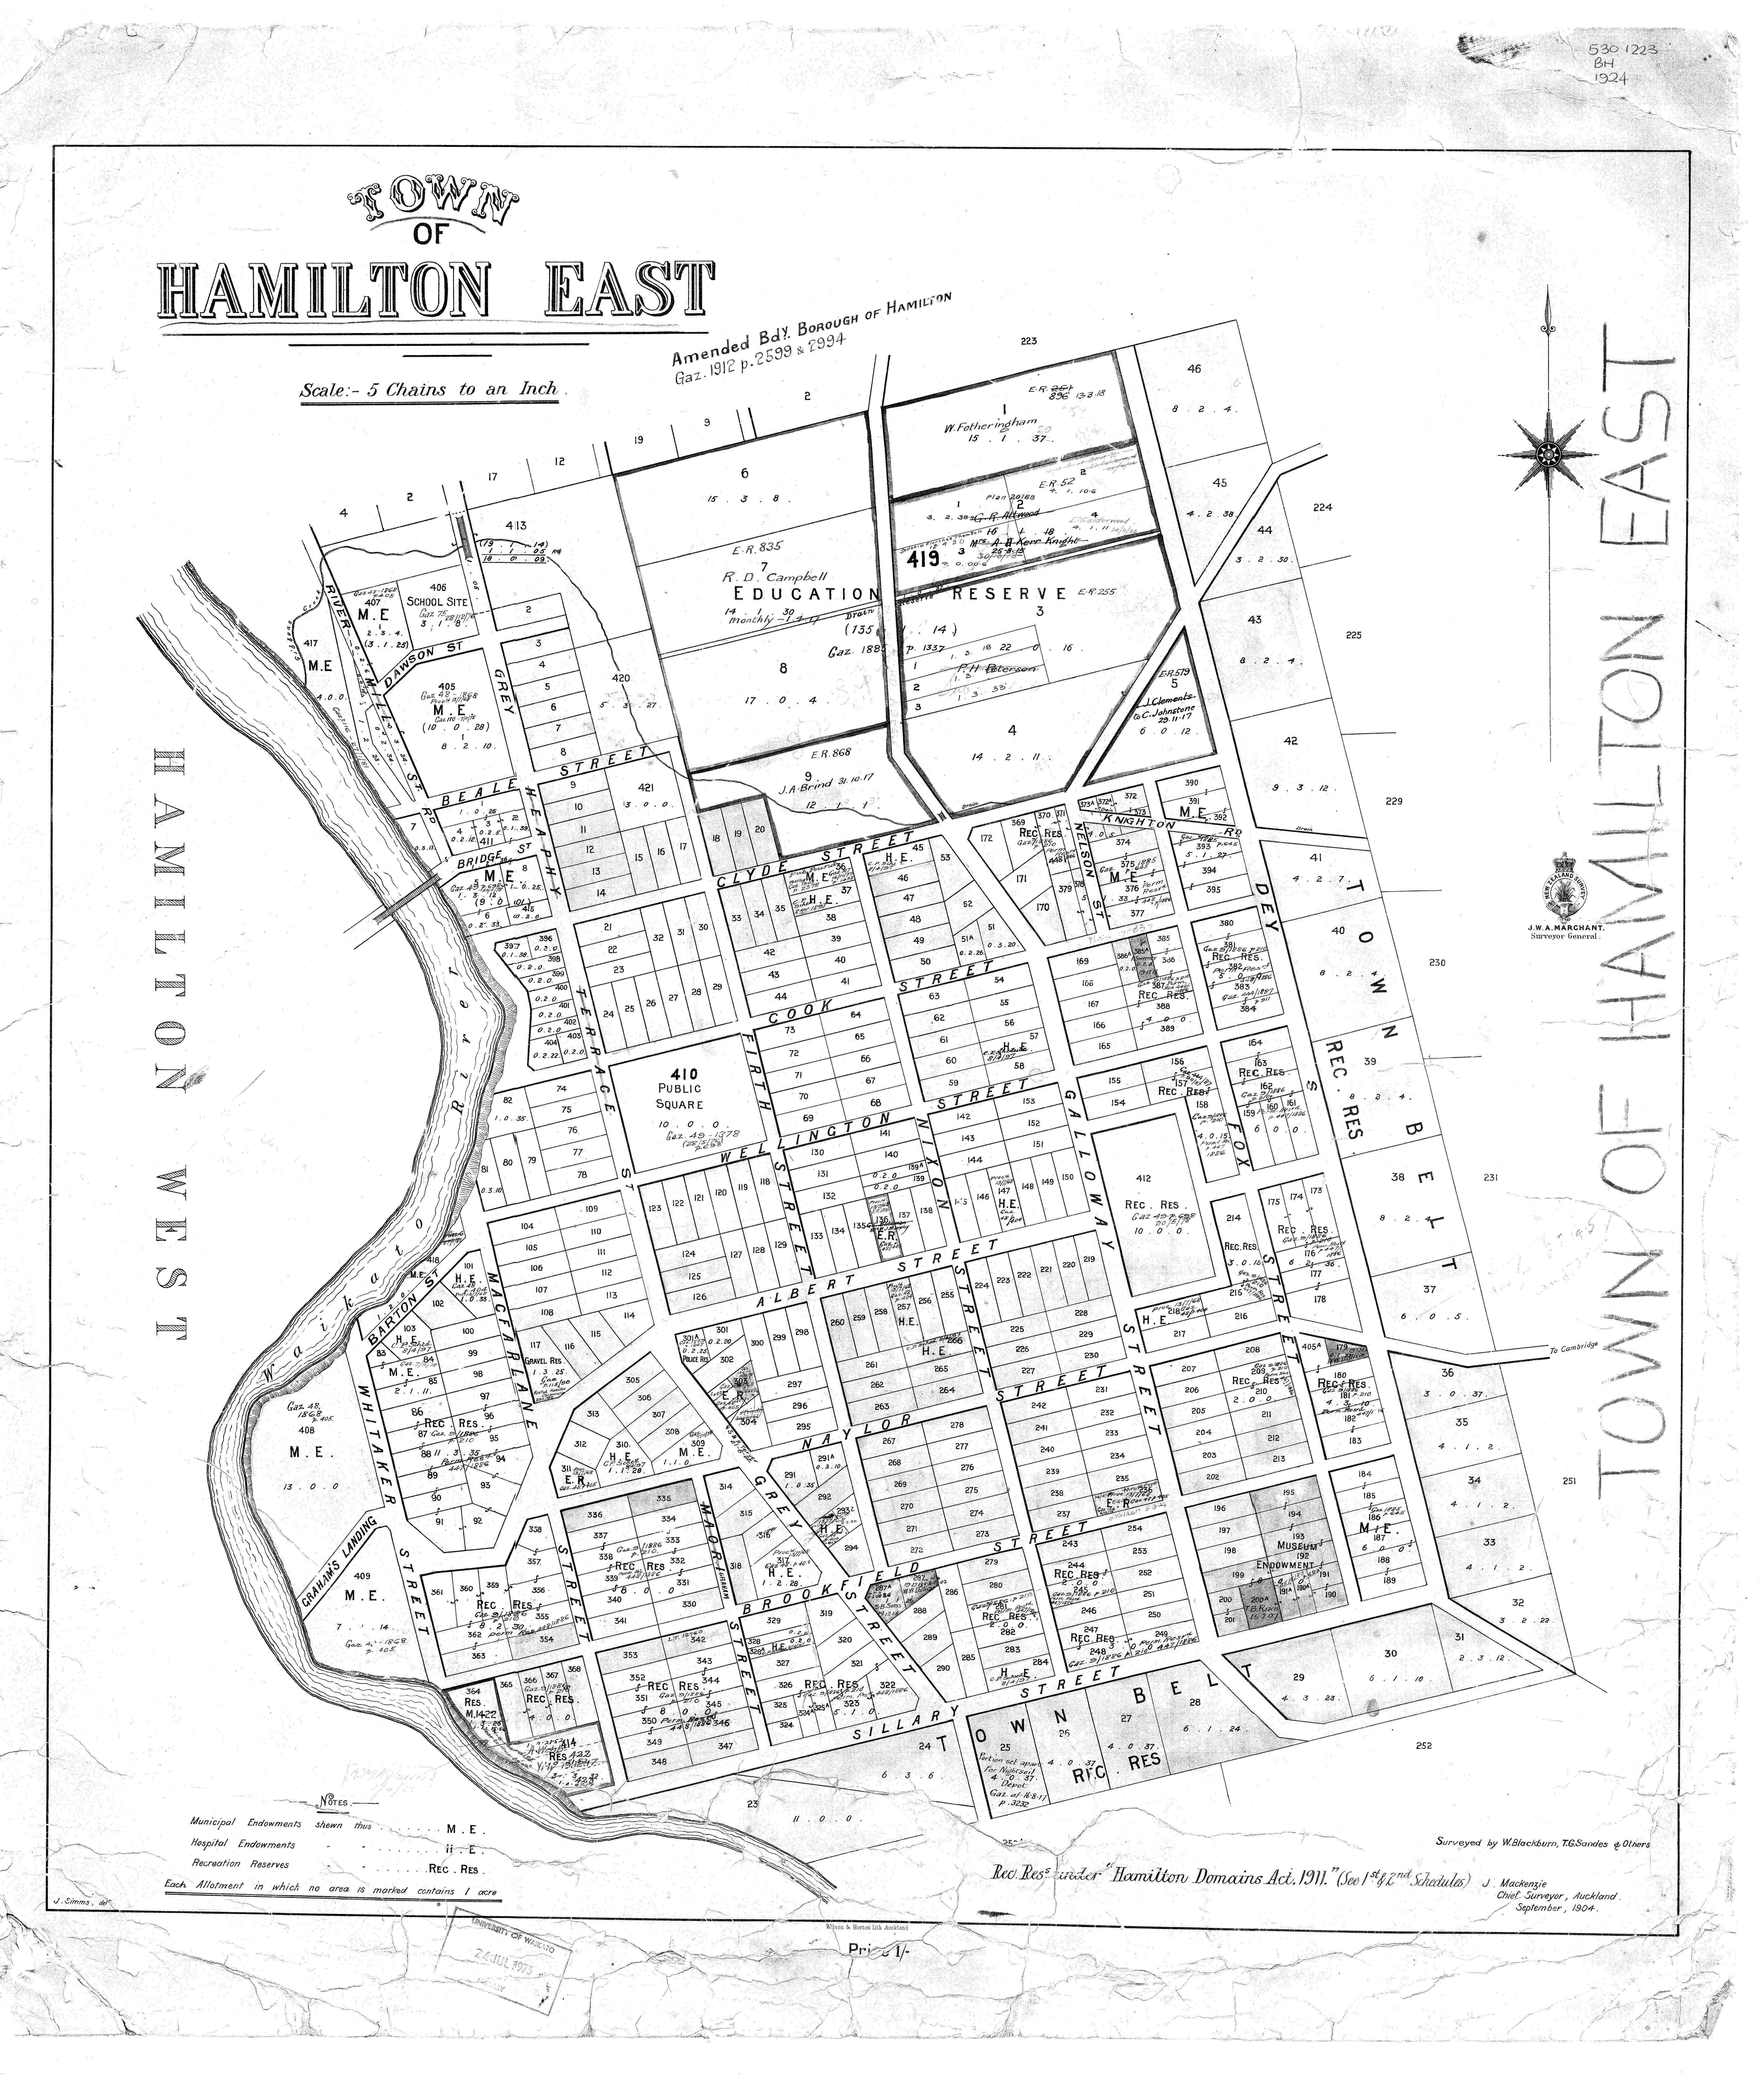 Hamilton East Historic Map